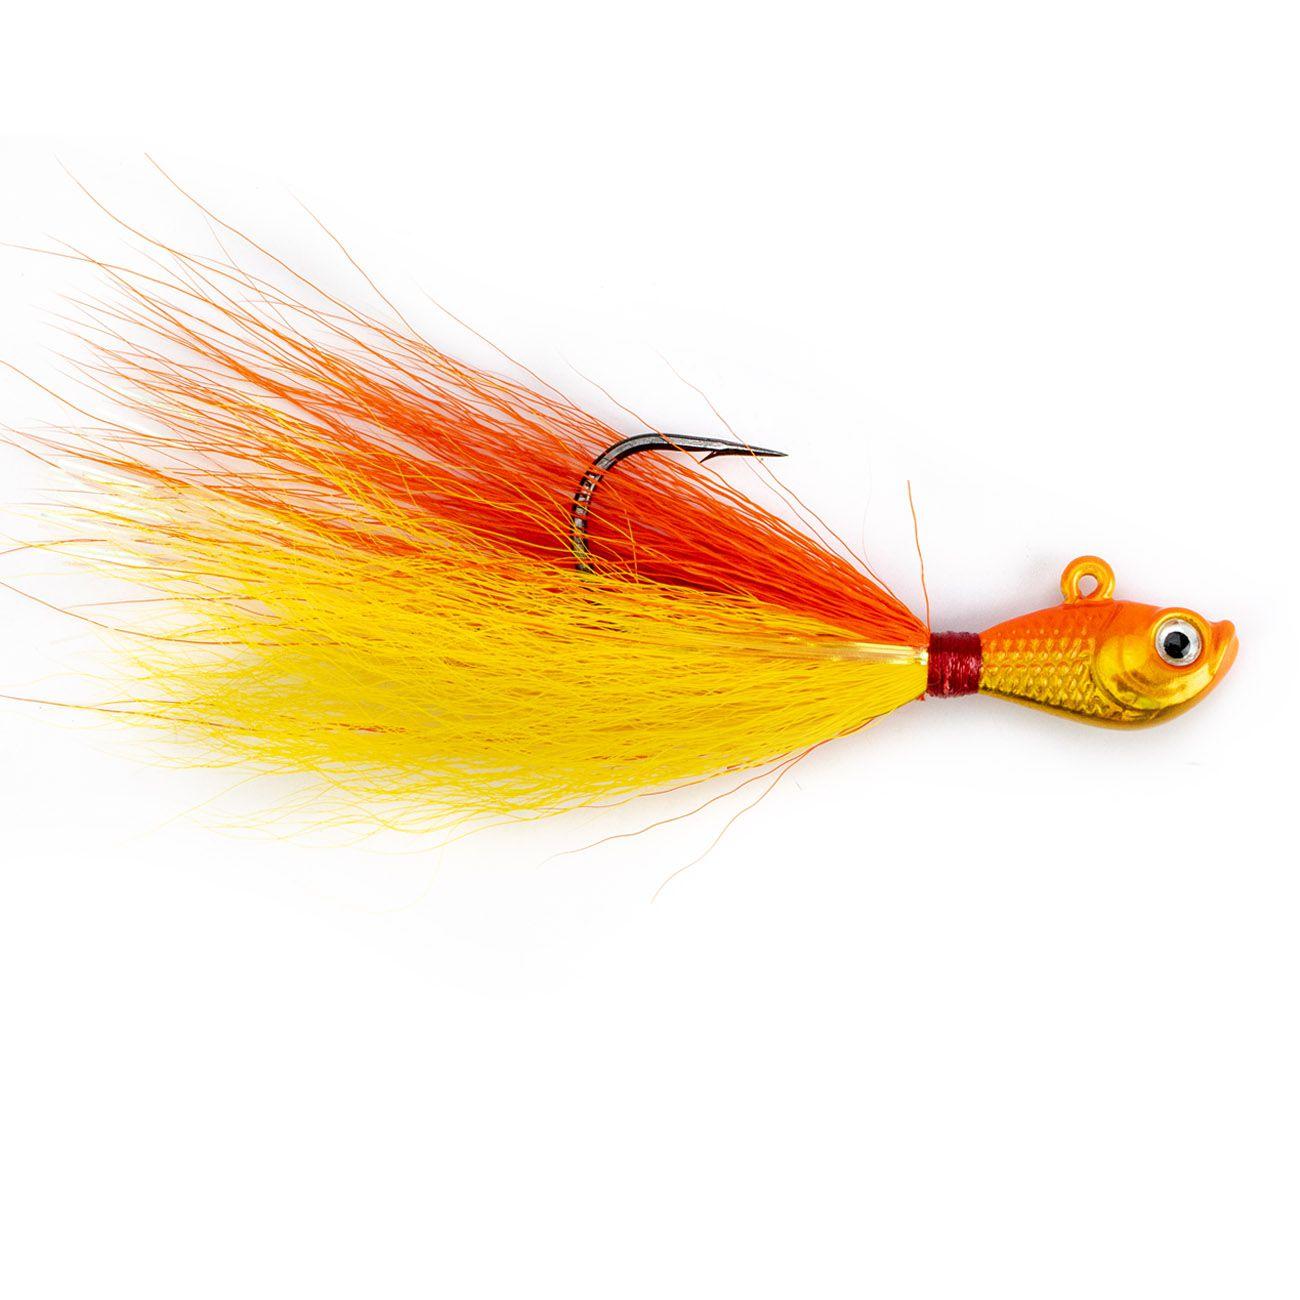 Jig Pro-Tsuri Cichla 4/0 15grs Bucktail Simples  - Comprando & Pescando